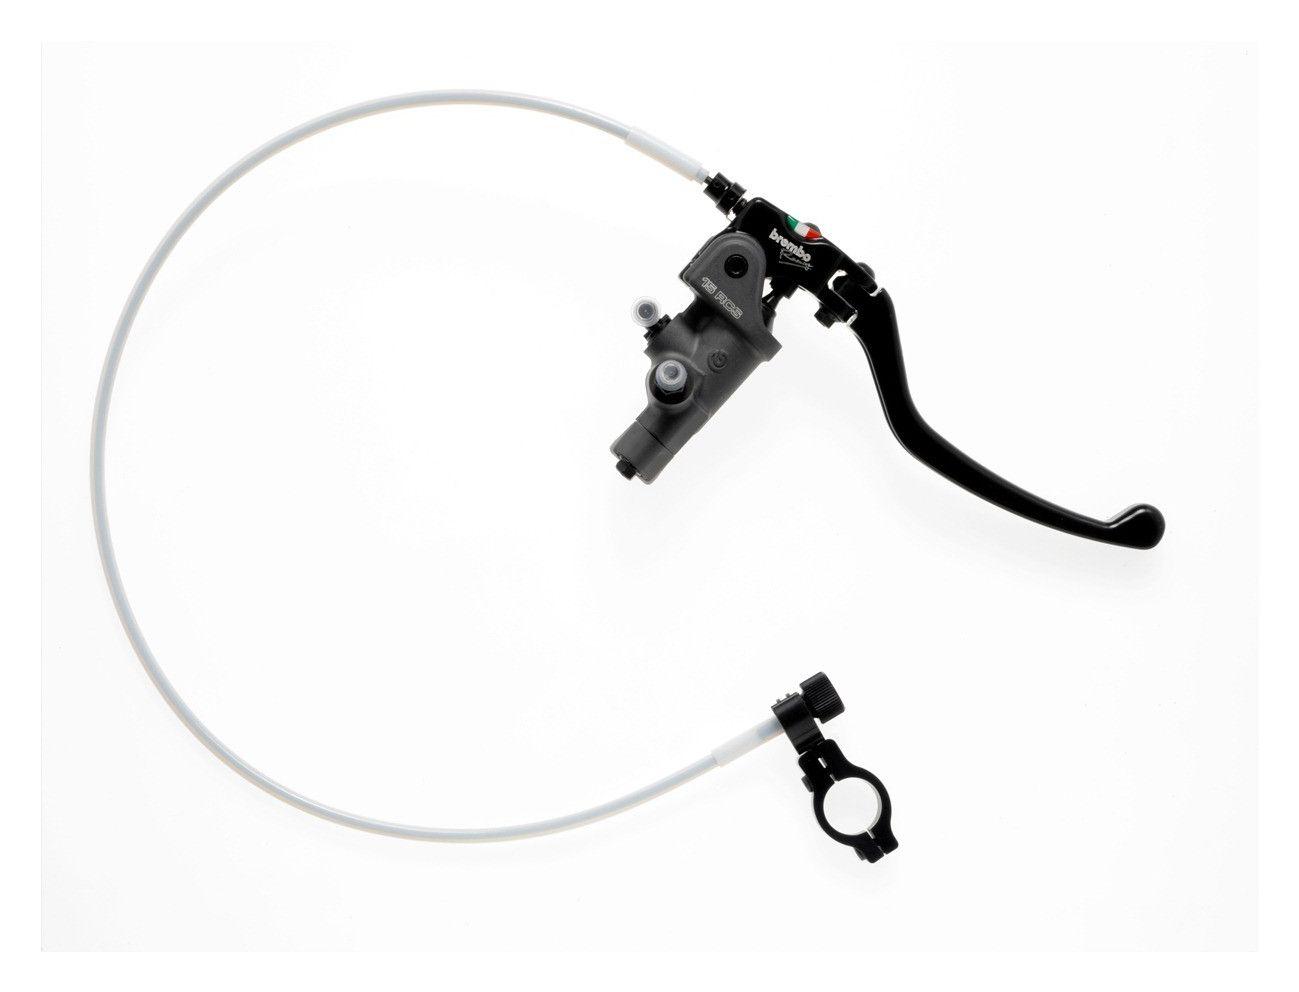 Brembo Remote Adjuster For Rcs Master Cylinders